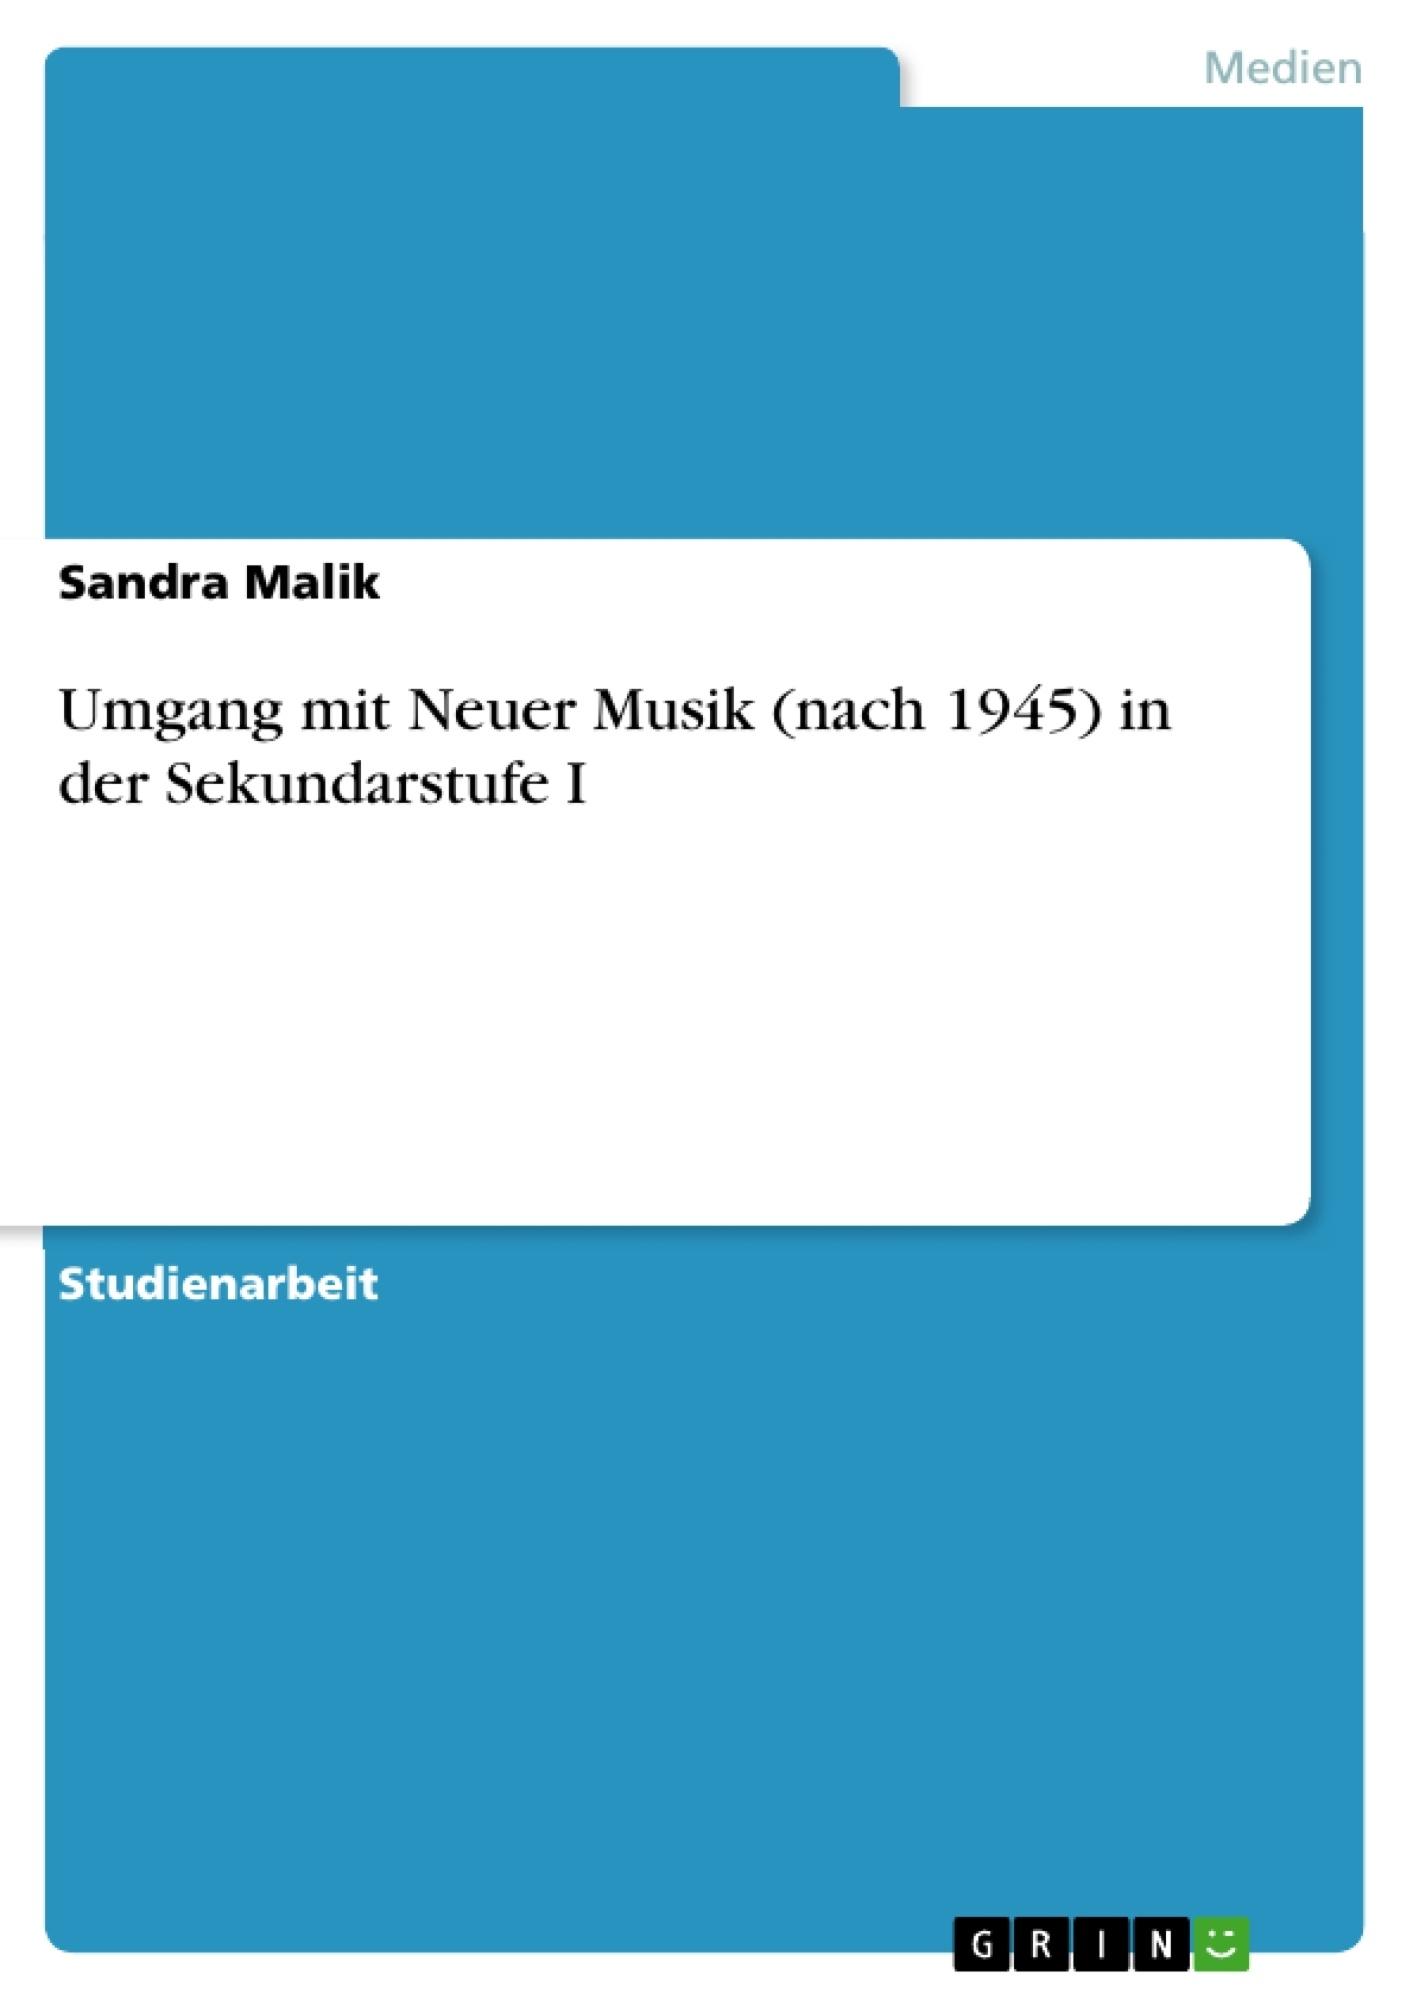 Titel: Umgang mit Neuer Musik (nach 1945) in der Sekundarstufe I